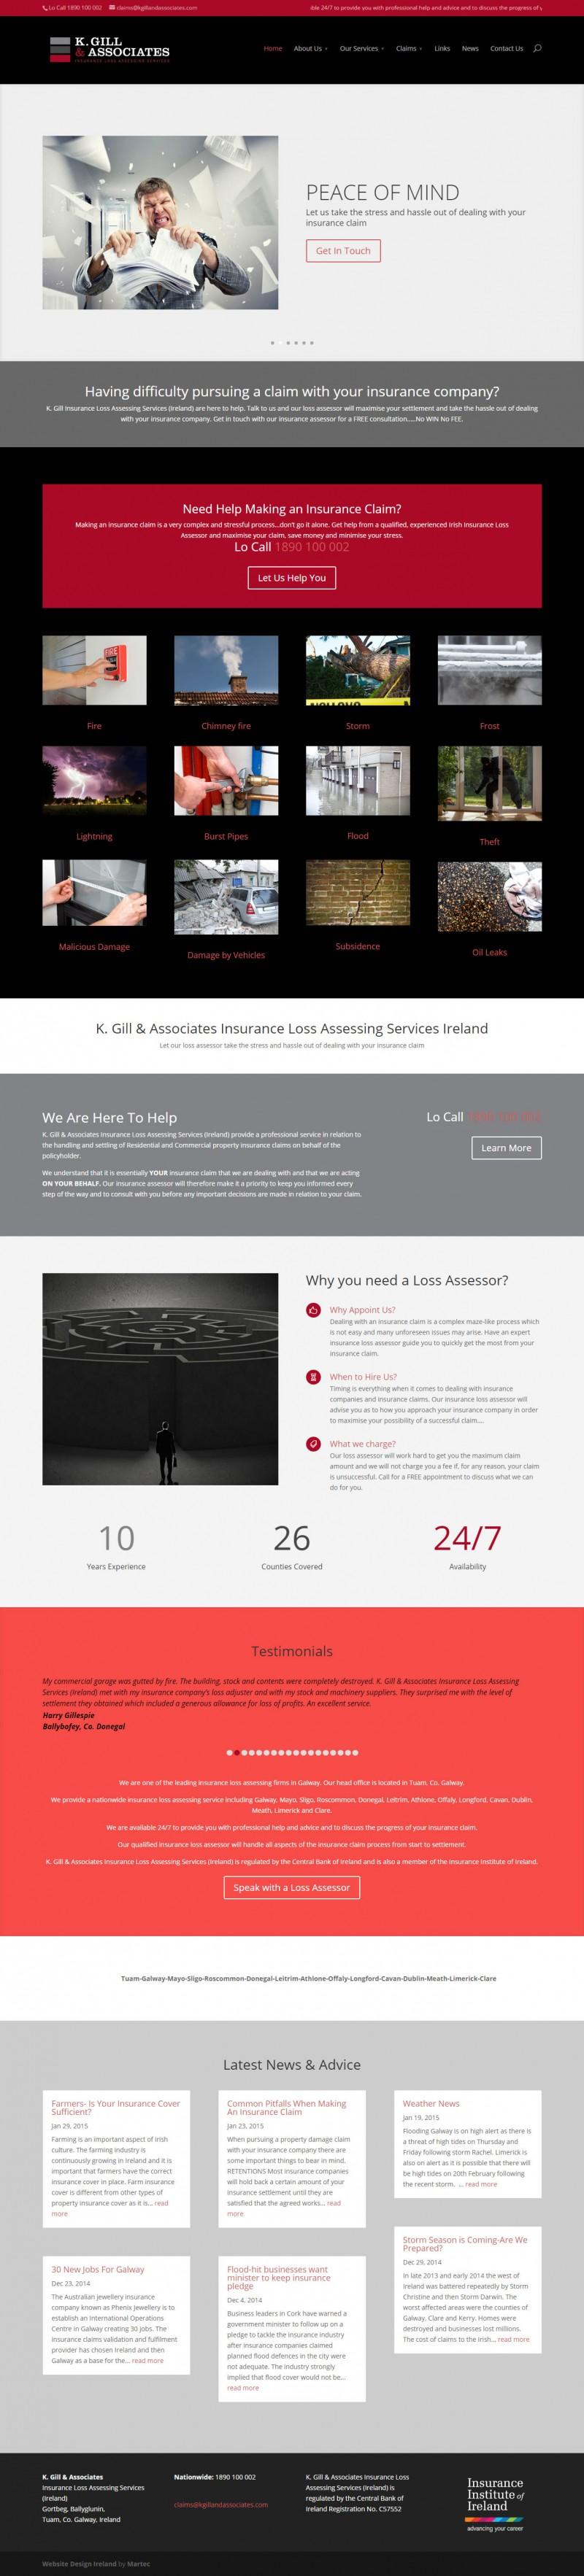 Loss Assessors Ireland   Kim Gill   Associates – Loss Assessors Ireland